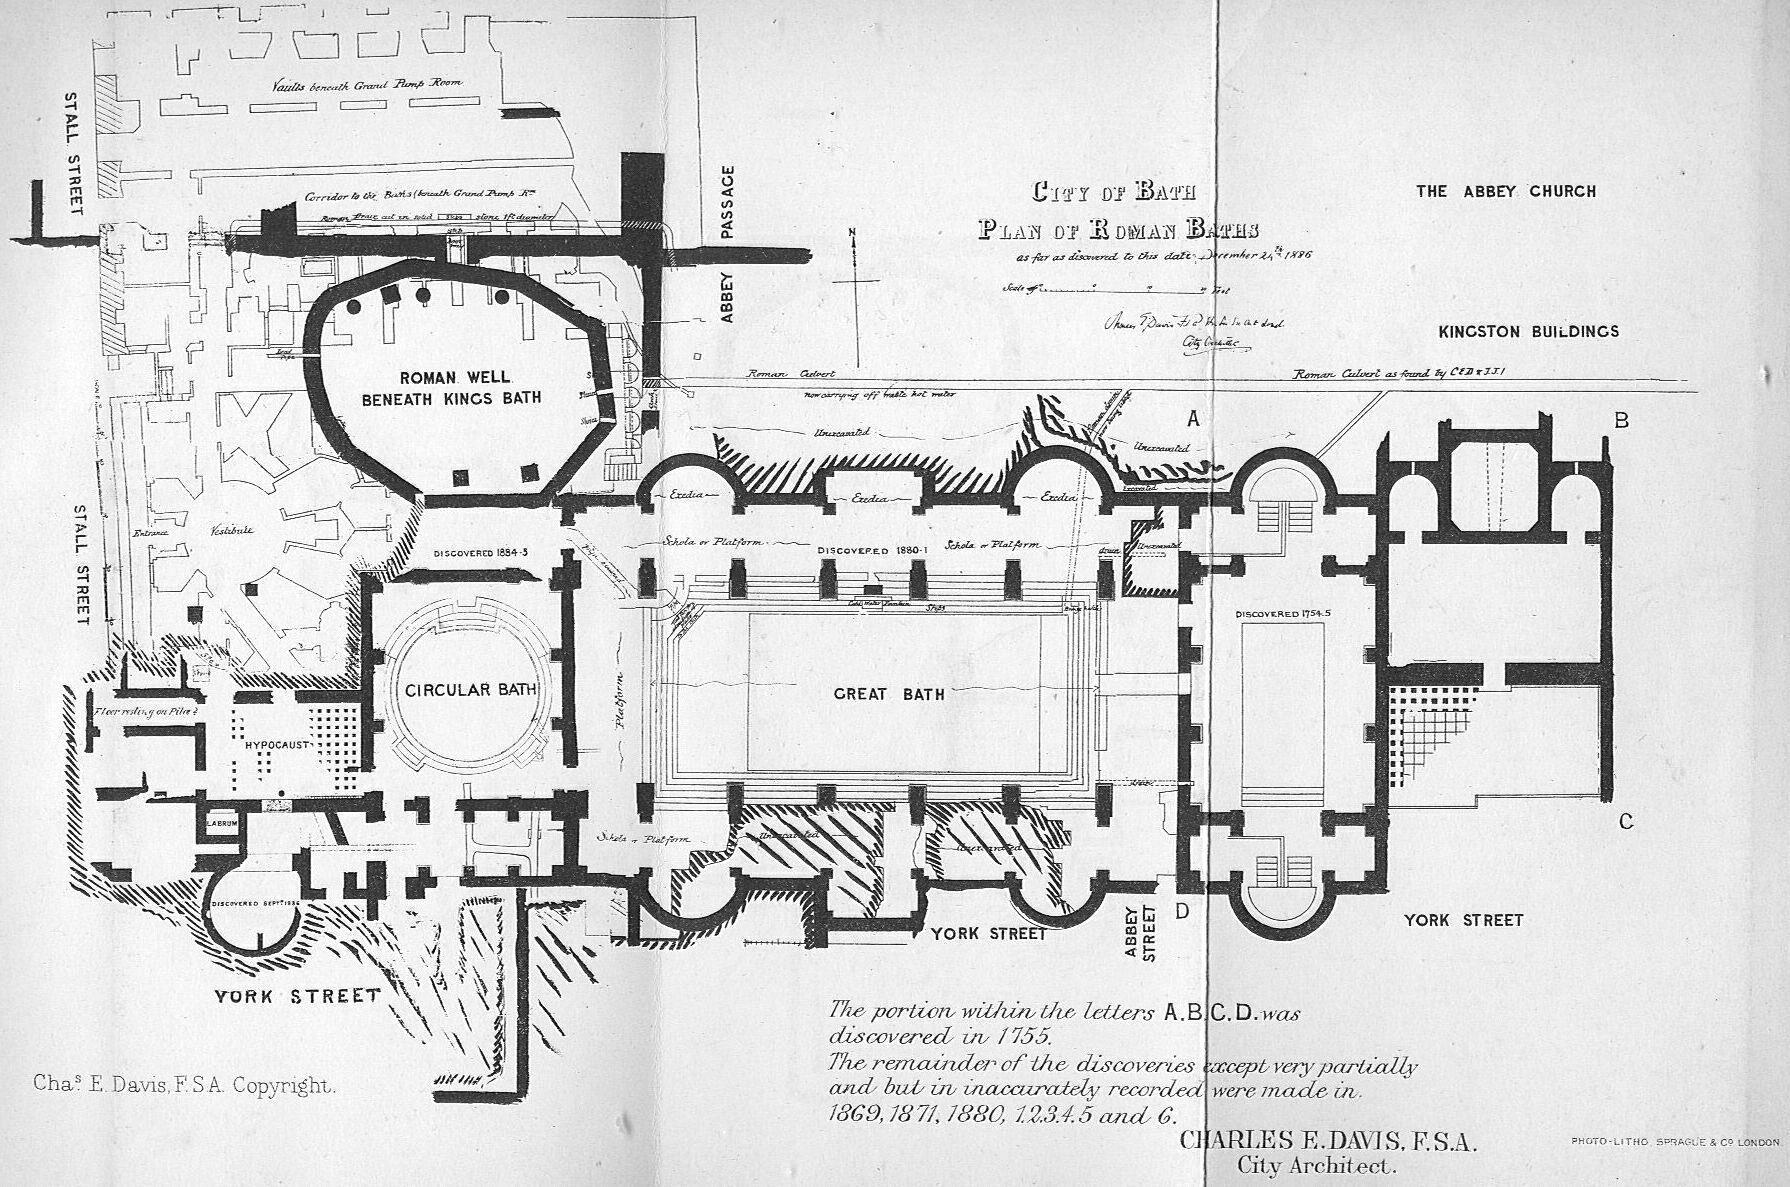 bedroom house floor plans ancient roman bath house floor plan from roman bath house floor plan image source futurehorizons us [ 1790 x 1187 Pixel ]